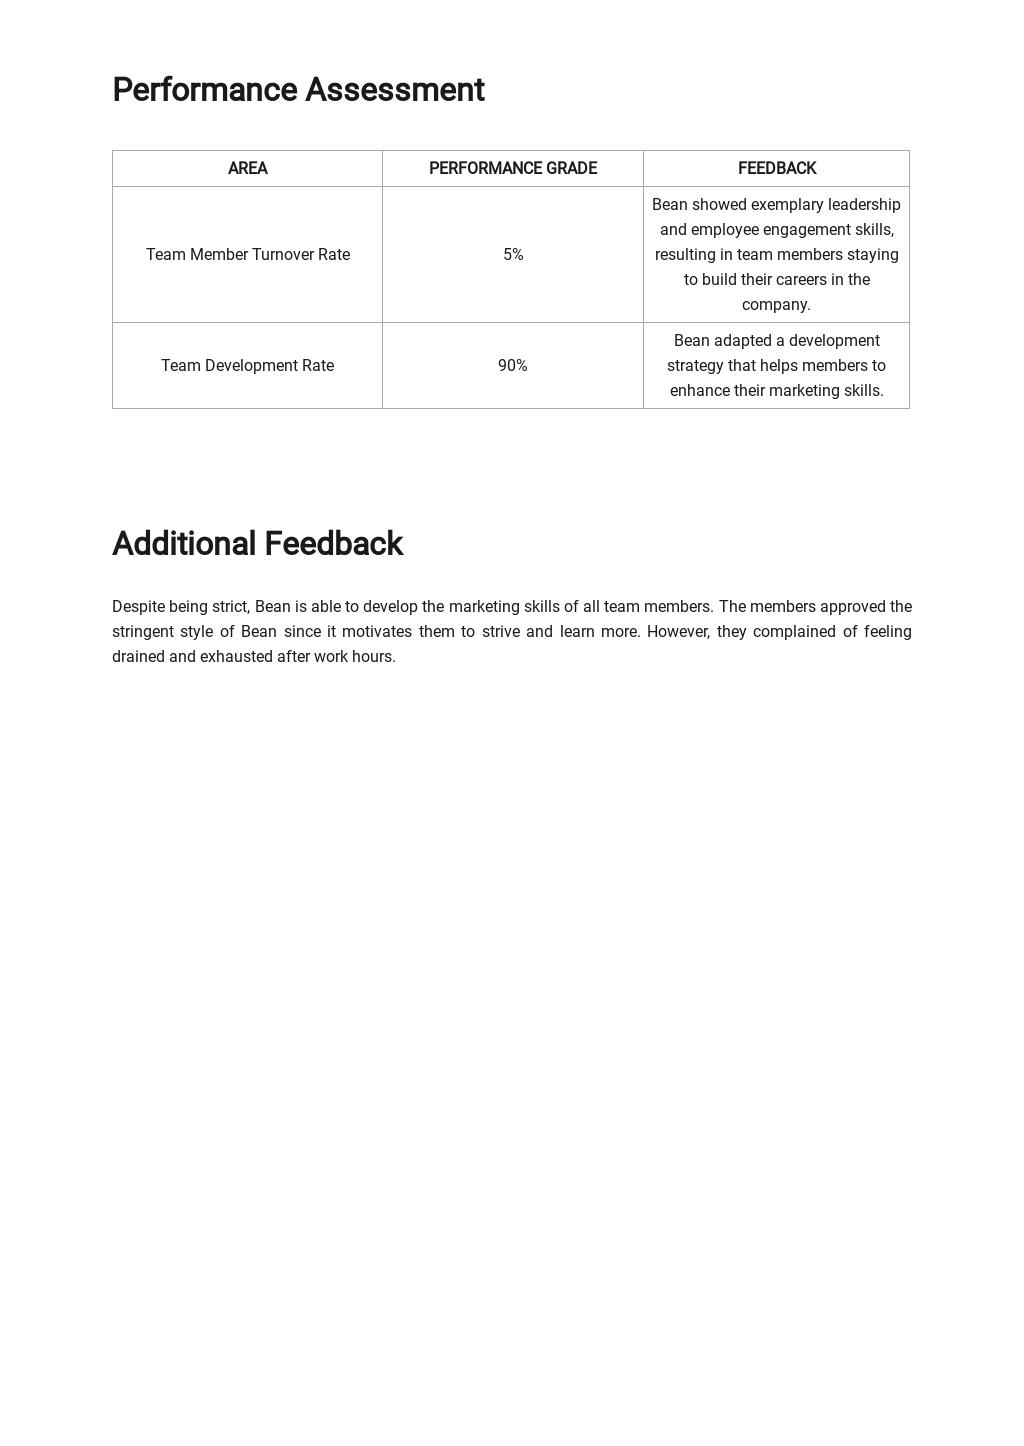 Performance Report Template 2.jpe